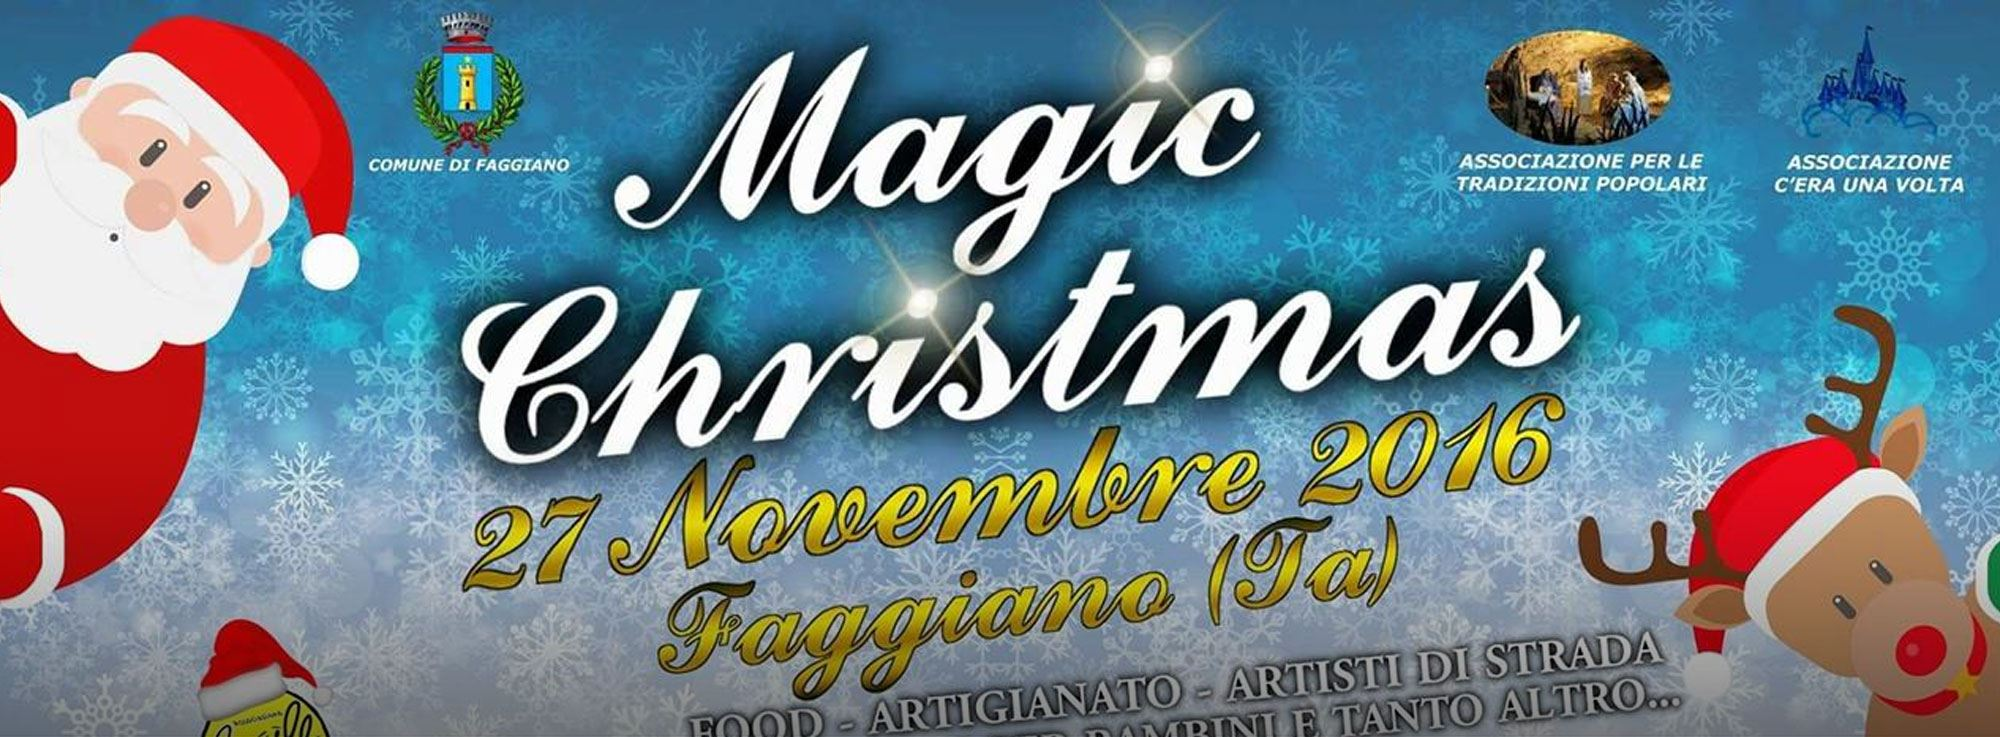 Faggiano: Magic Christmas 2016, mercatino di Natale